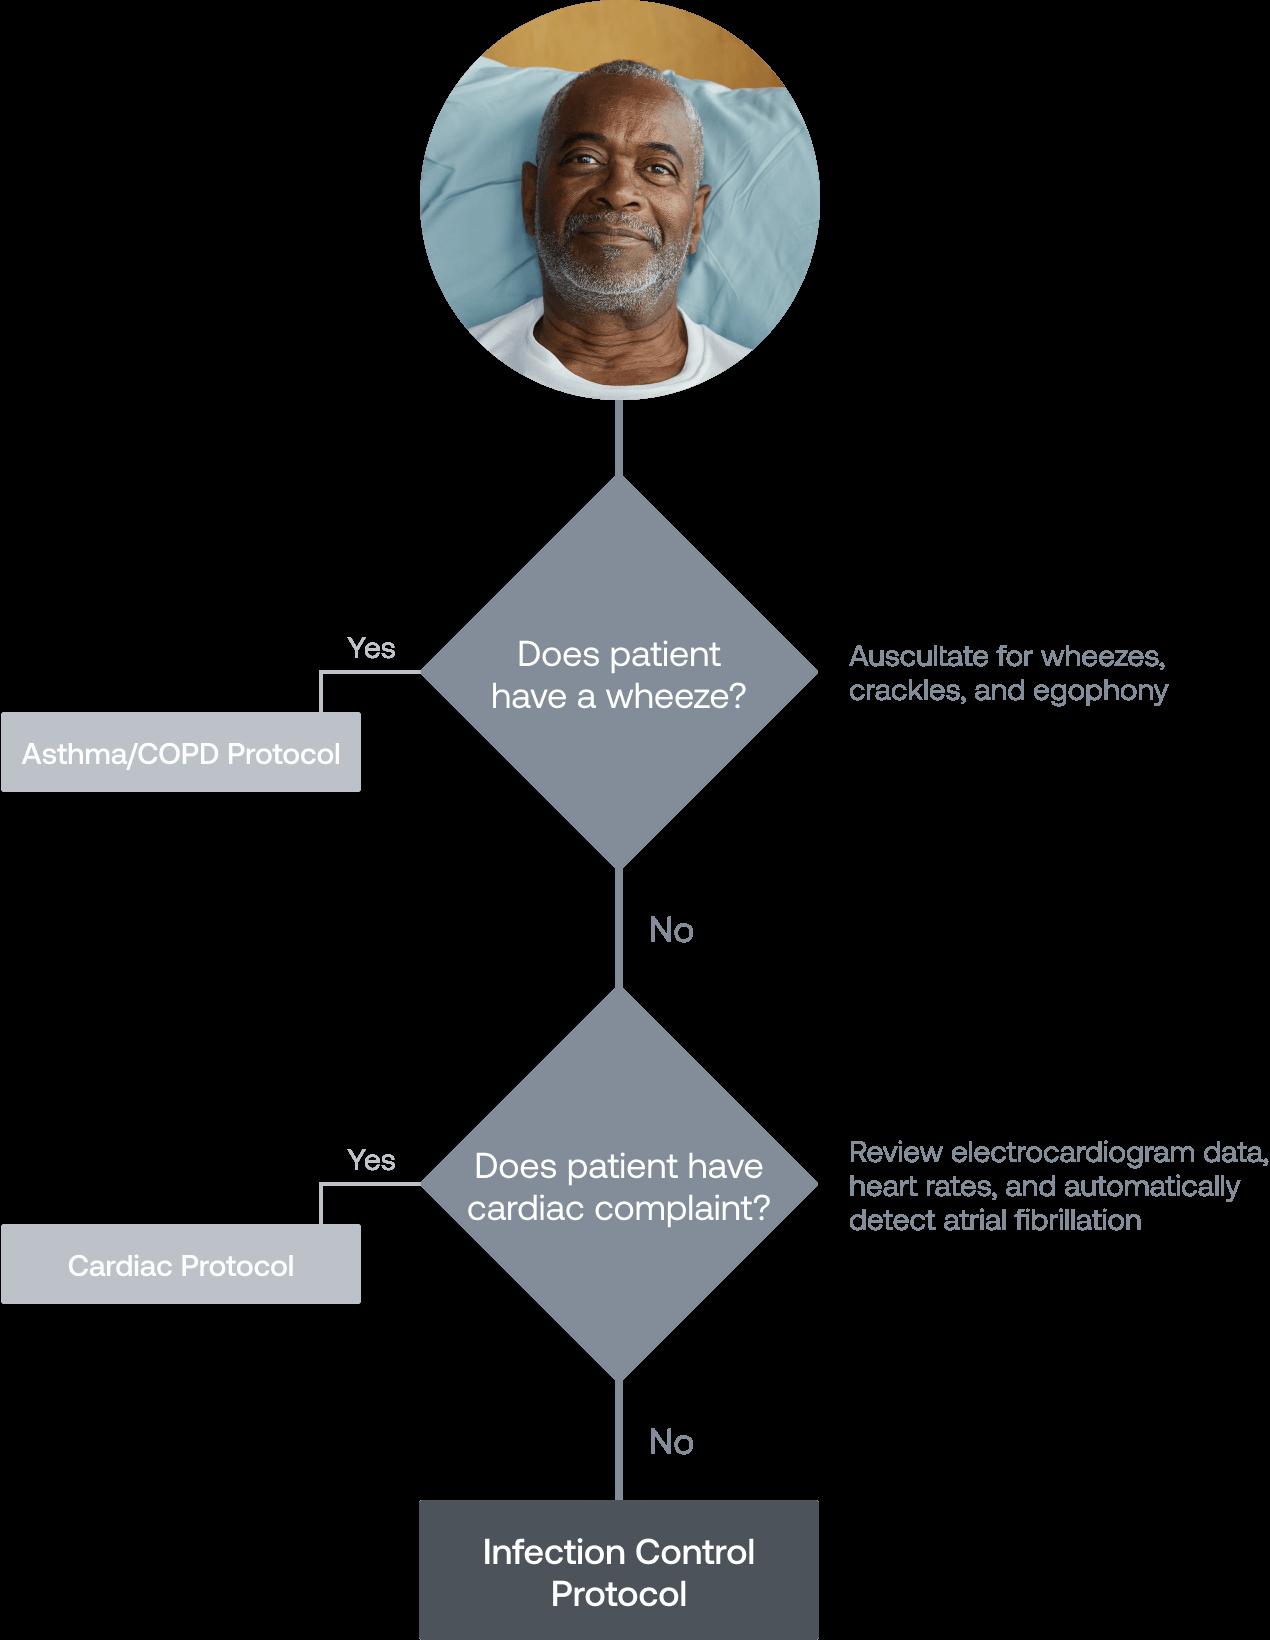 Triage Decision Tree